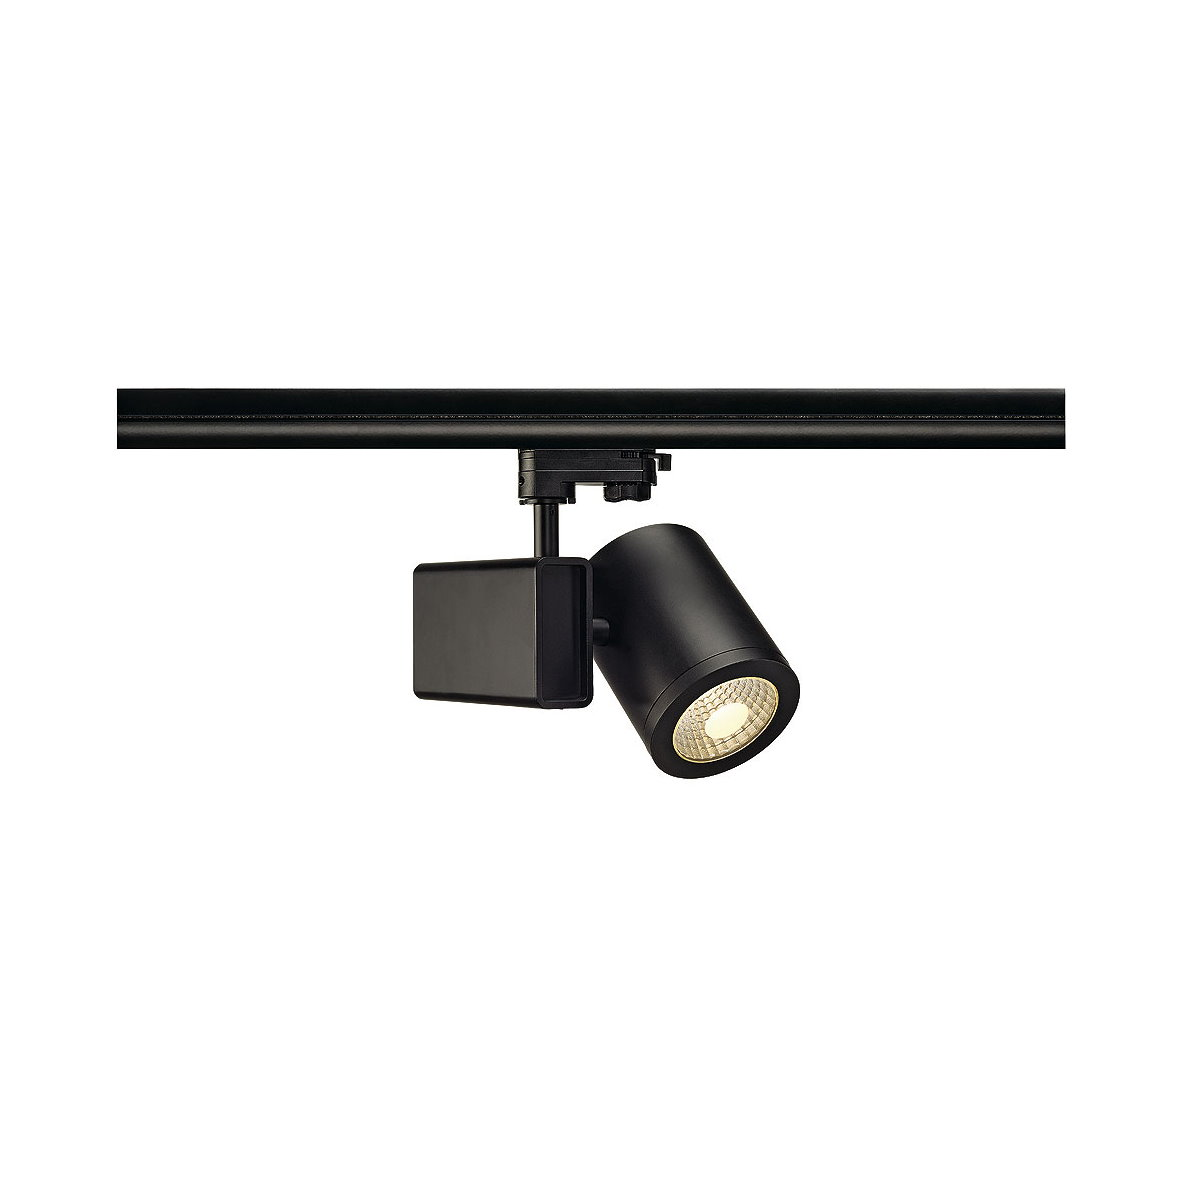 slv led 3 phasen spot strahler leuchte stromschiene lichtschiene 230v 3p alu ebay. Black Bedroom Furniture Sets. Home Design Ideas